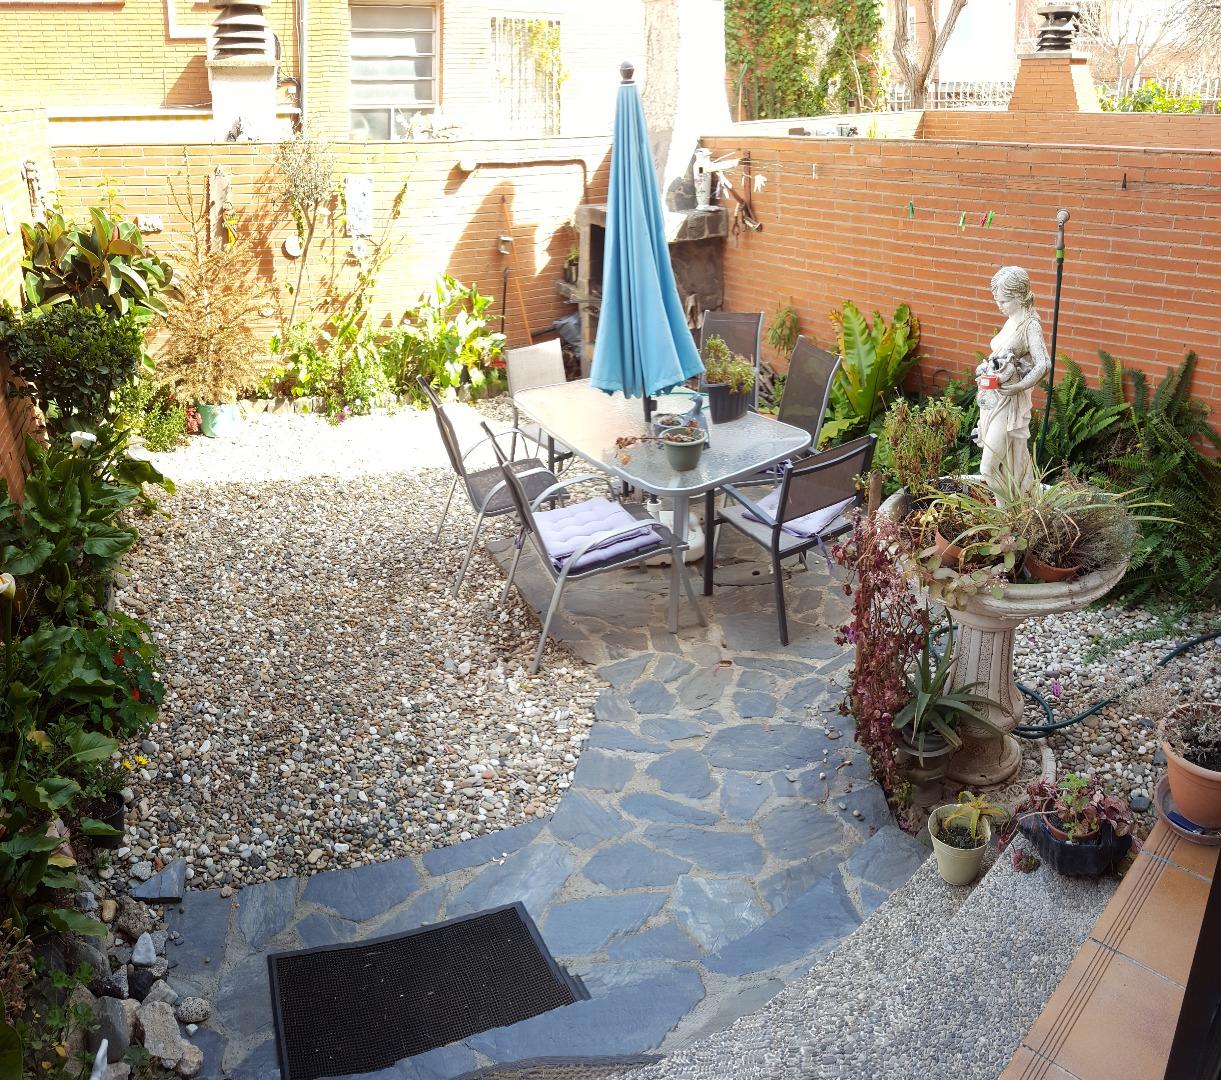 Lloguer Casa  Carrer matagalls. Alquiler de preciosa casa en morera con 40m2. de jardín amueblad